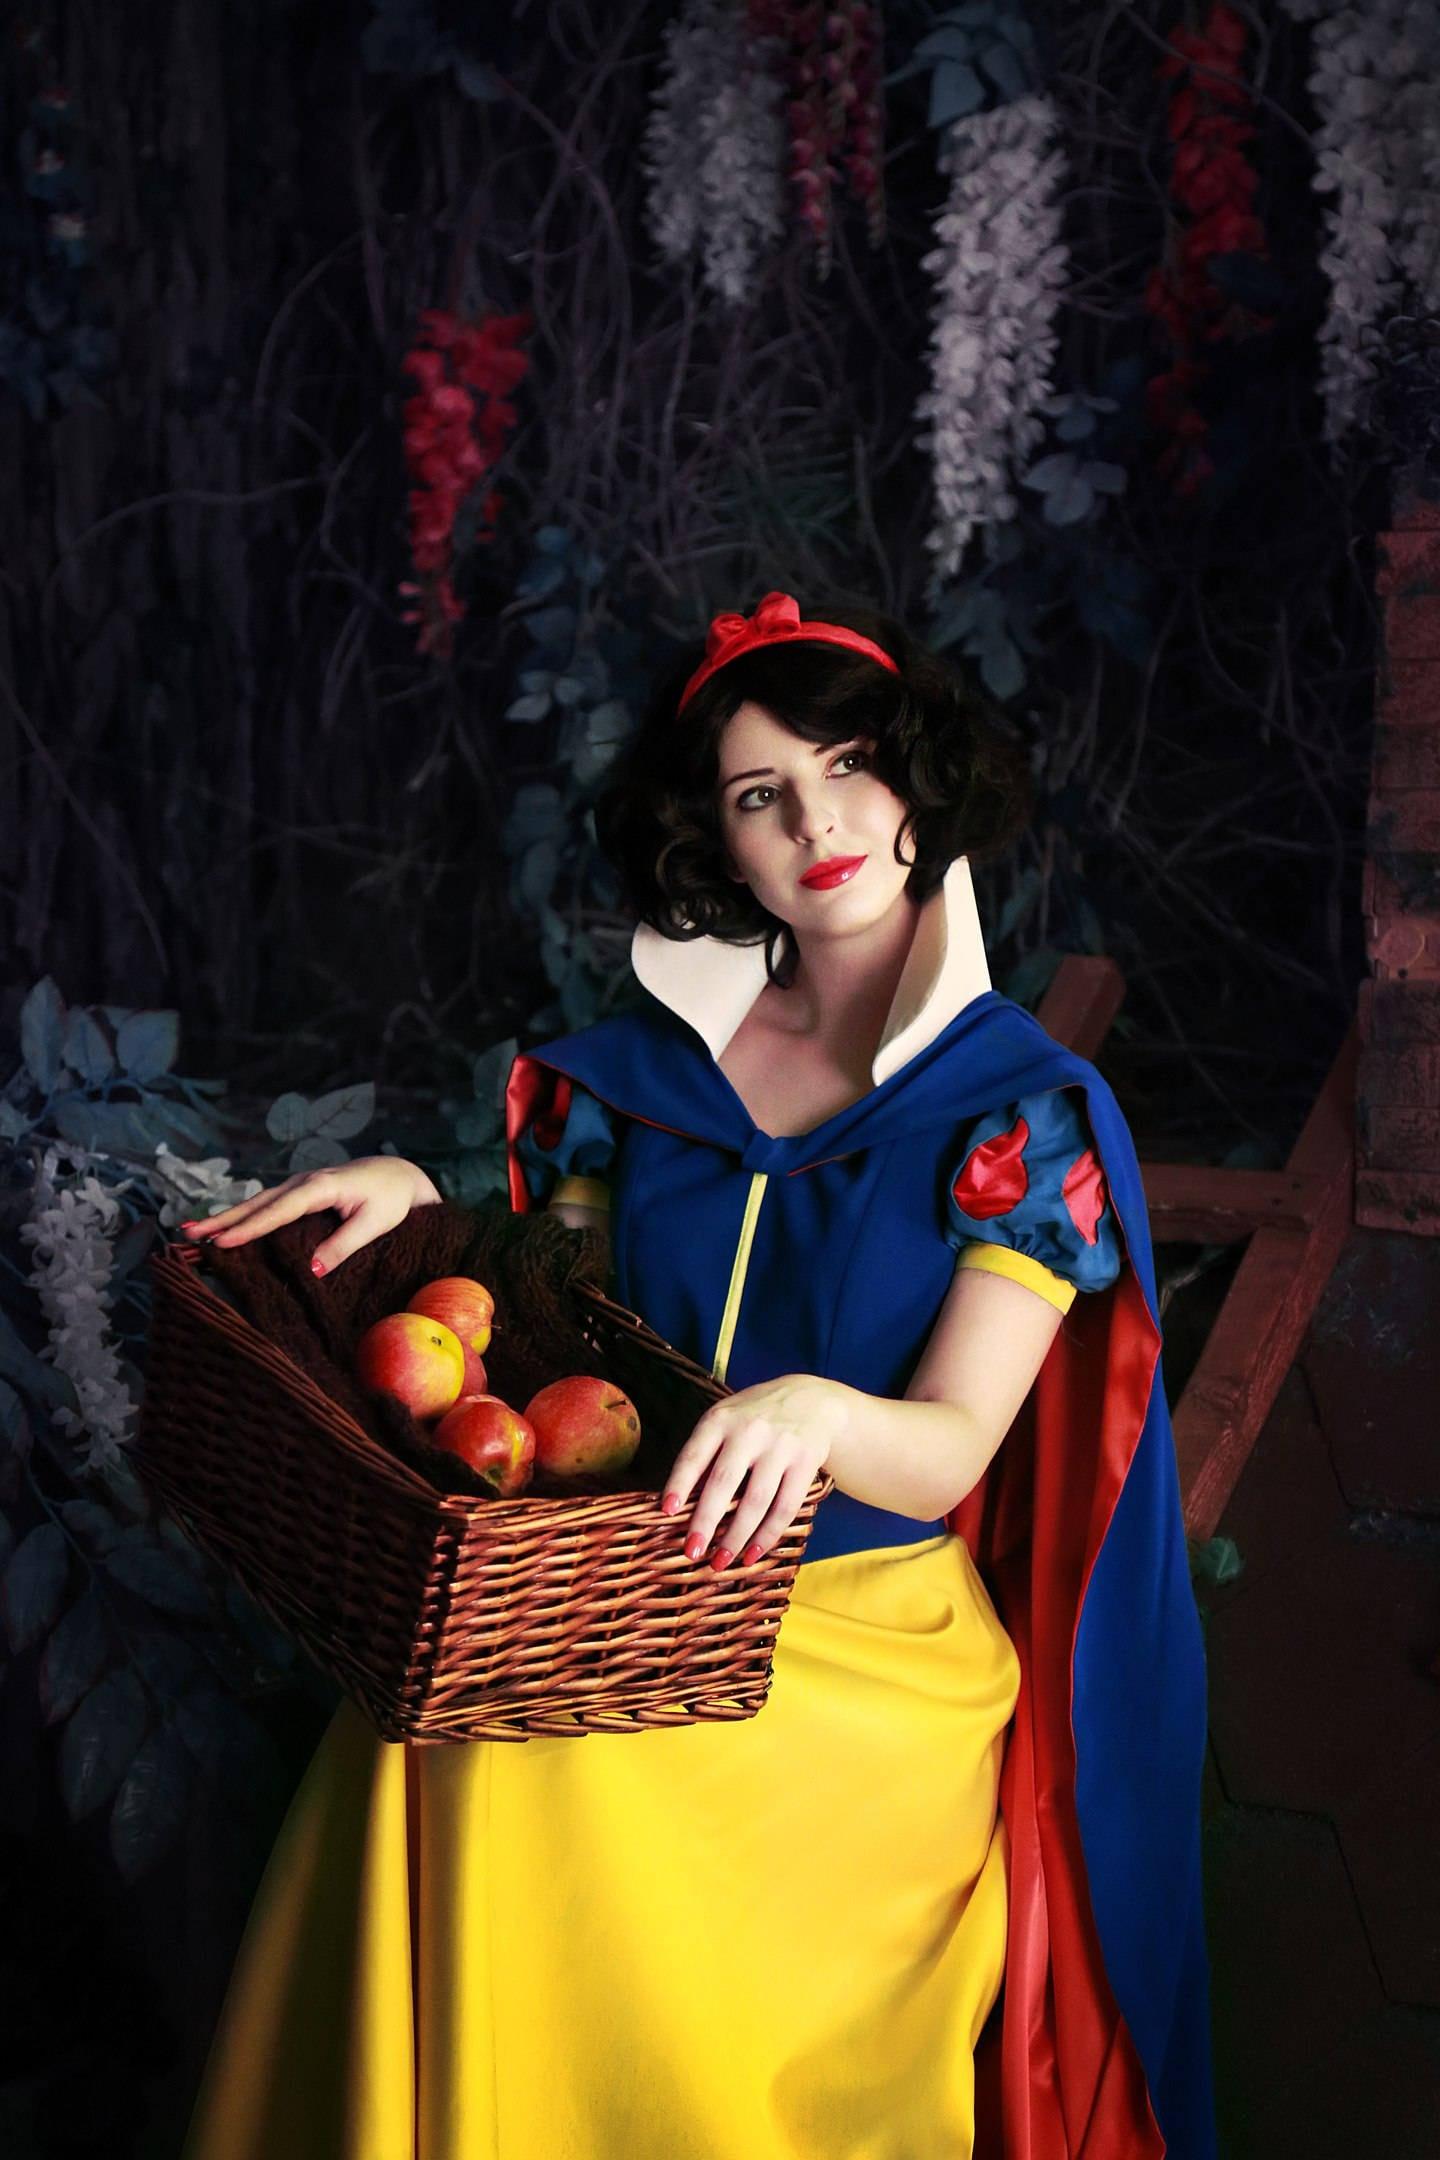 Snow White cosplay costume adult Disney princess Adult